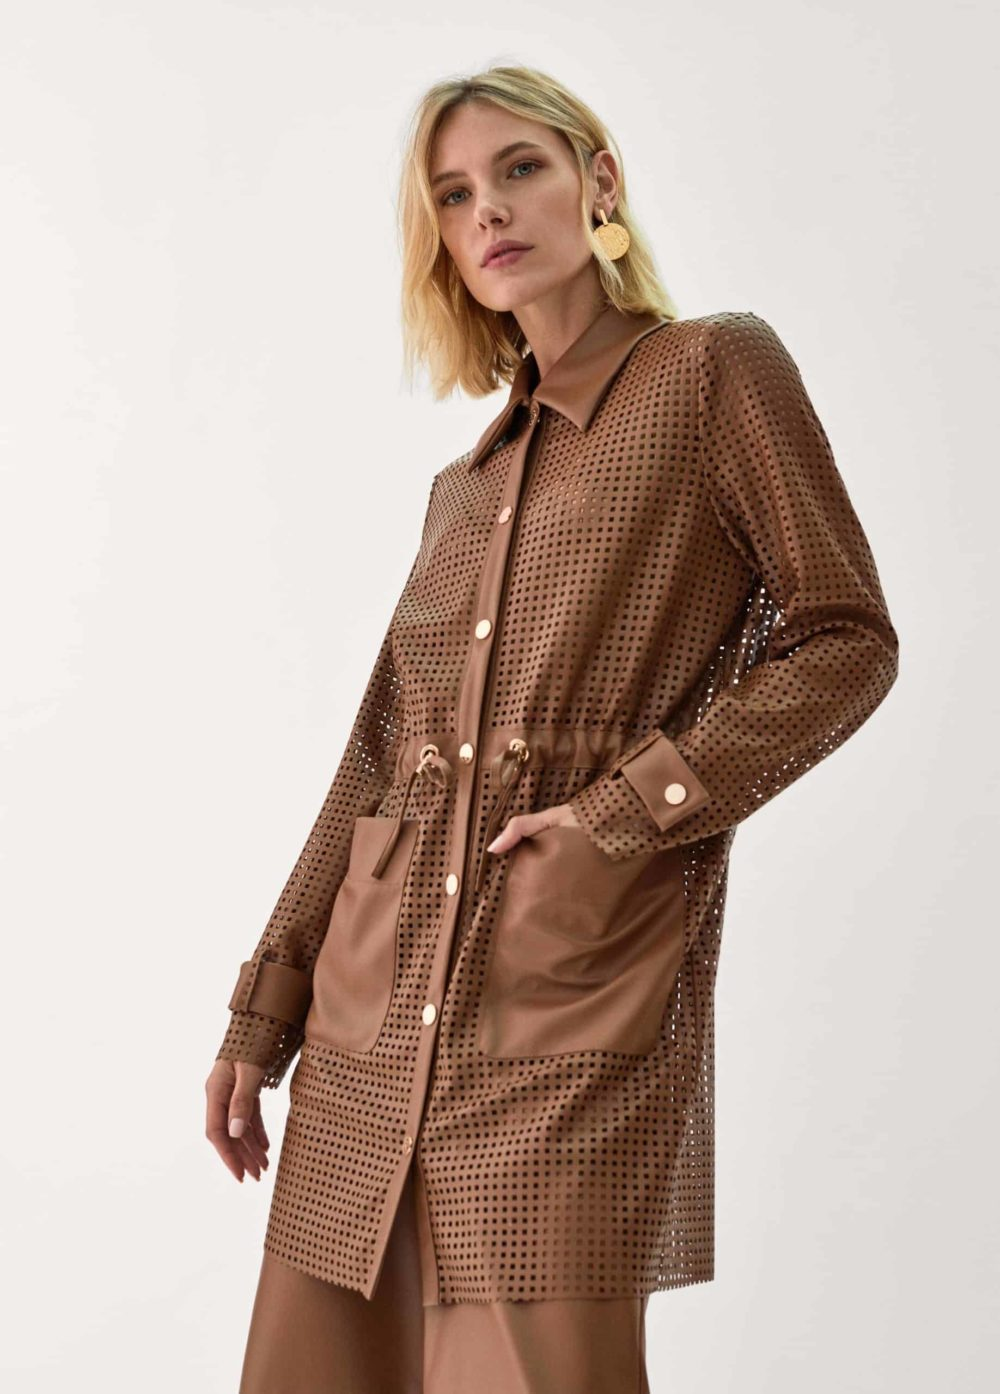 sahariana-troquelada-chaqueta-marron